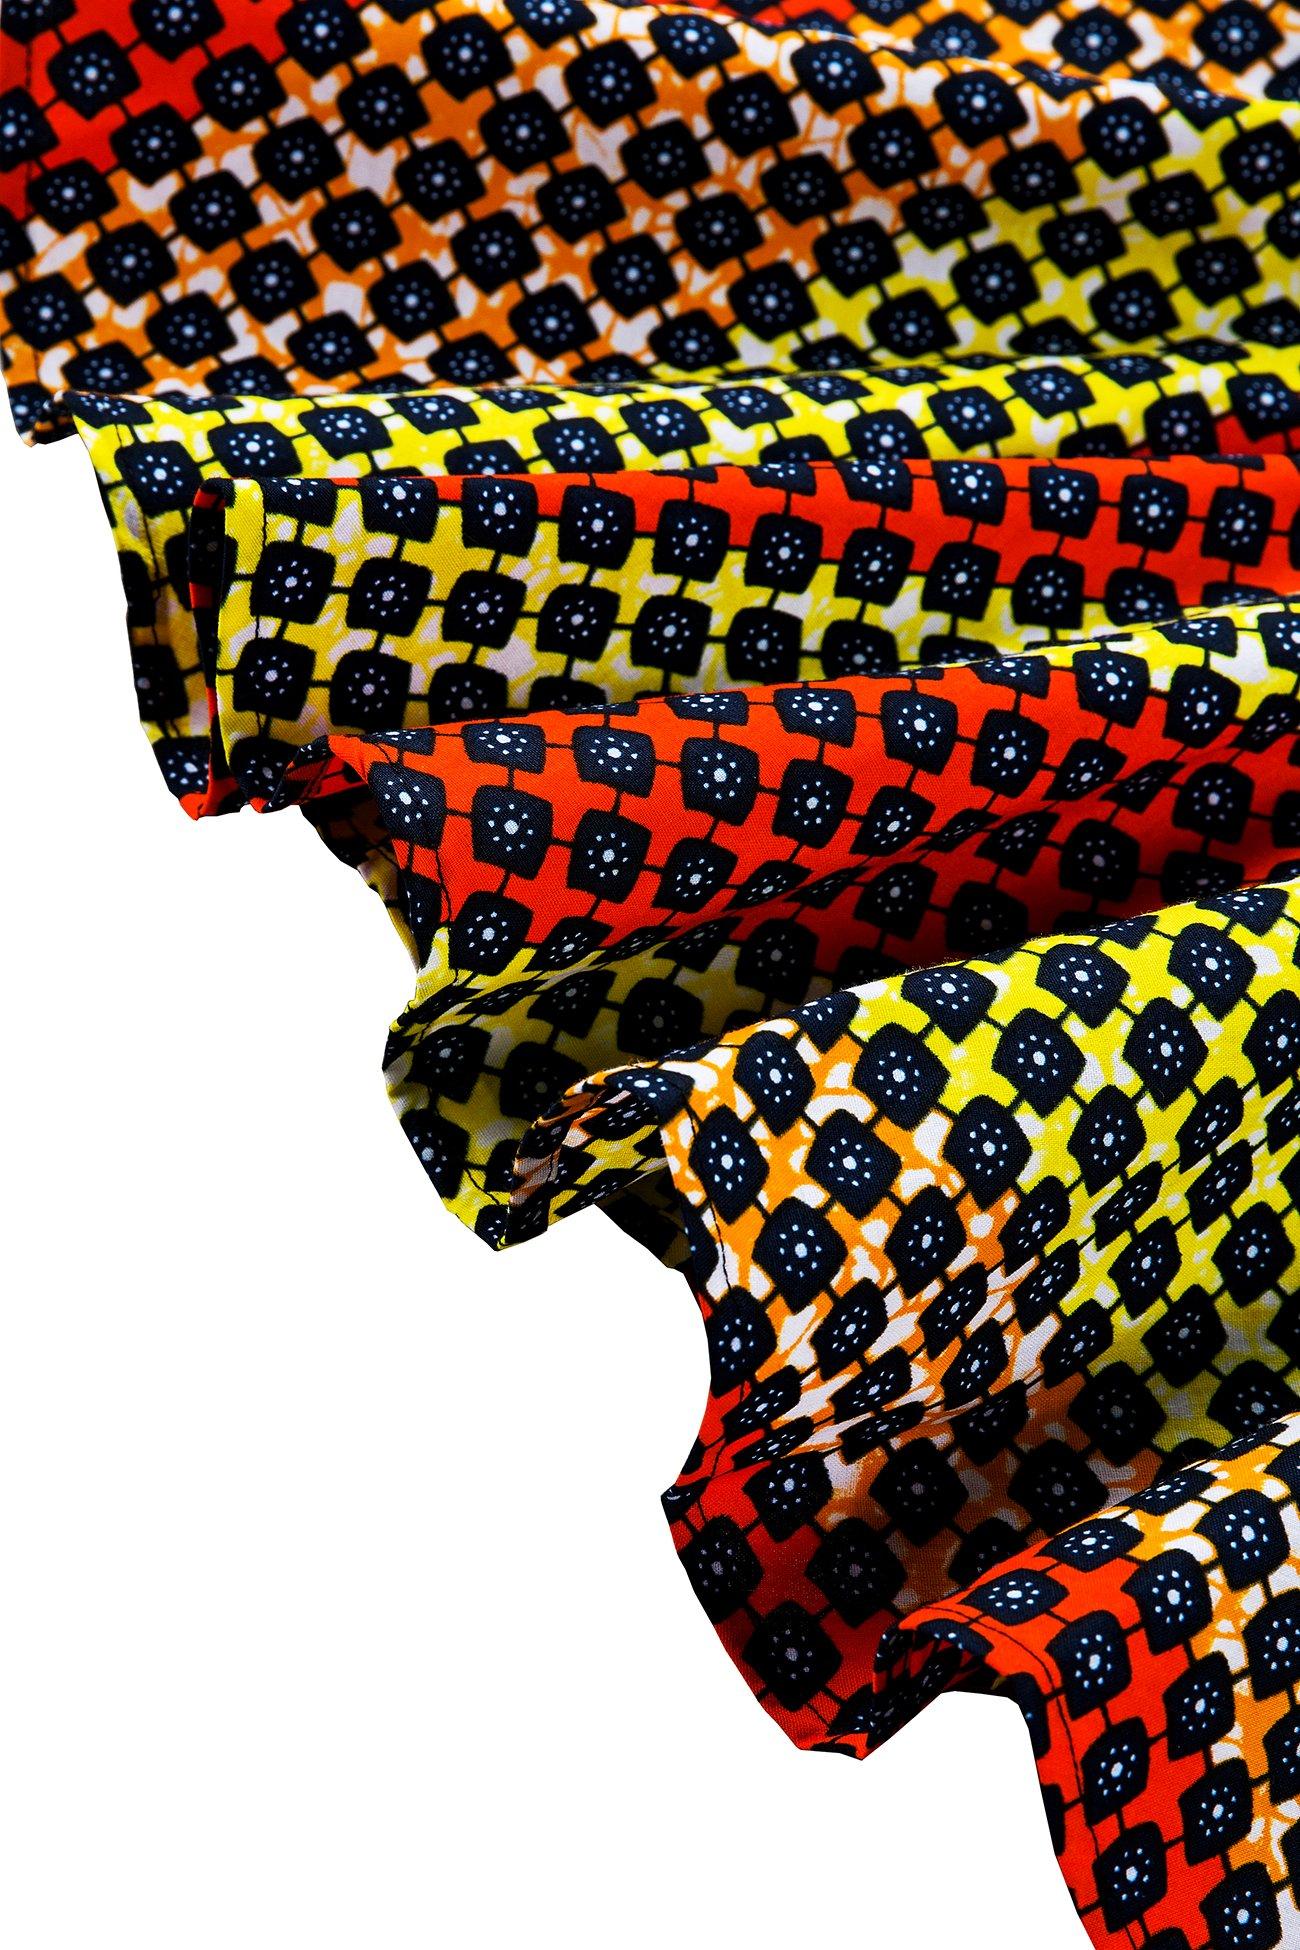 Shenbolen Womens Dashiki Tops Sleeveless Summer African Printed Slim Fit Shirts Blouse (Medium,B) by Shenbolen (Image #5)